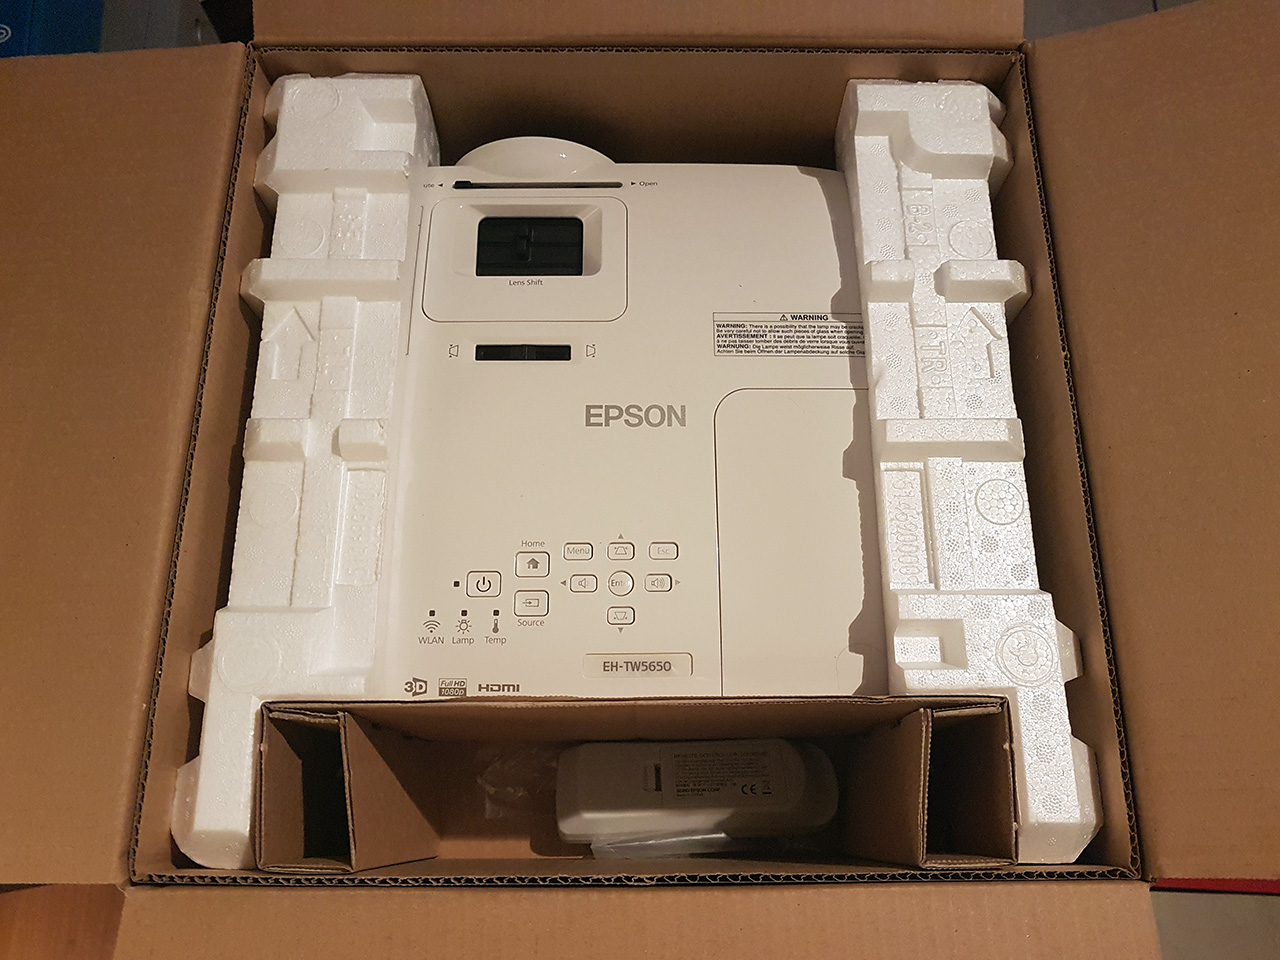 Espon EH-TW5650 full review | projectorjunkies